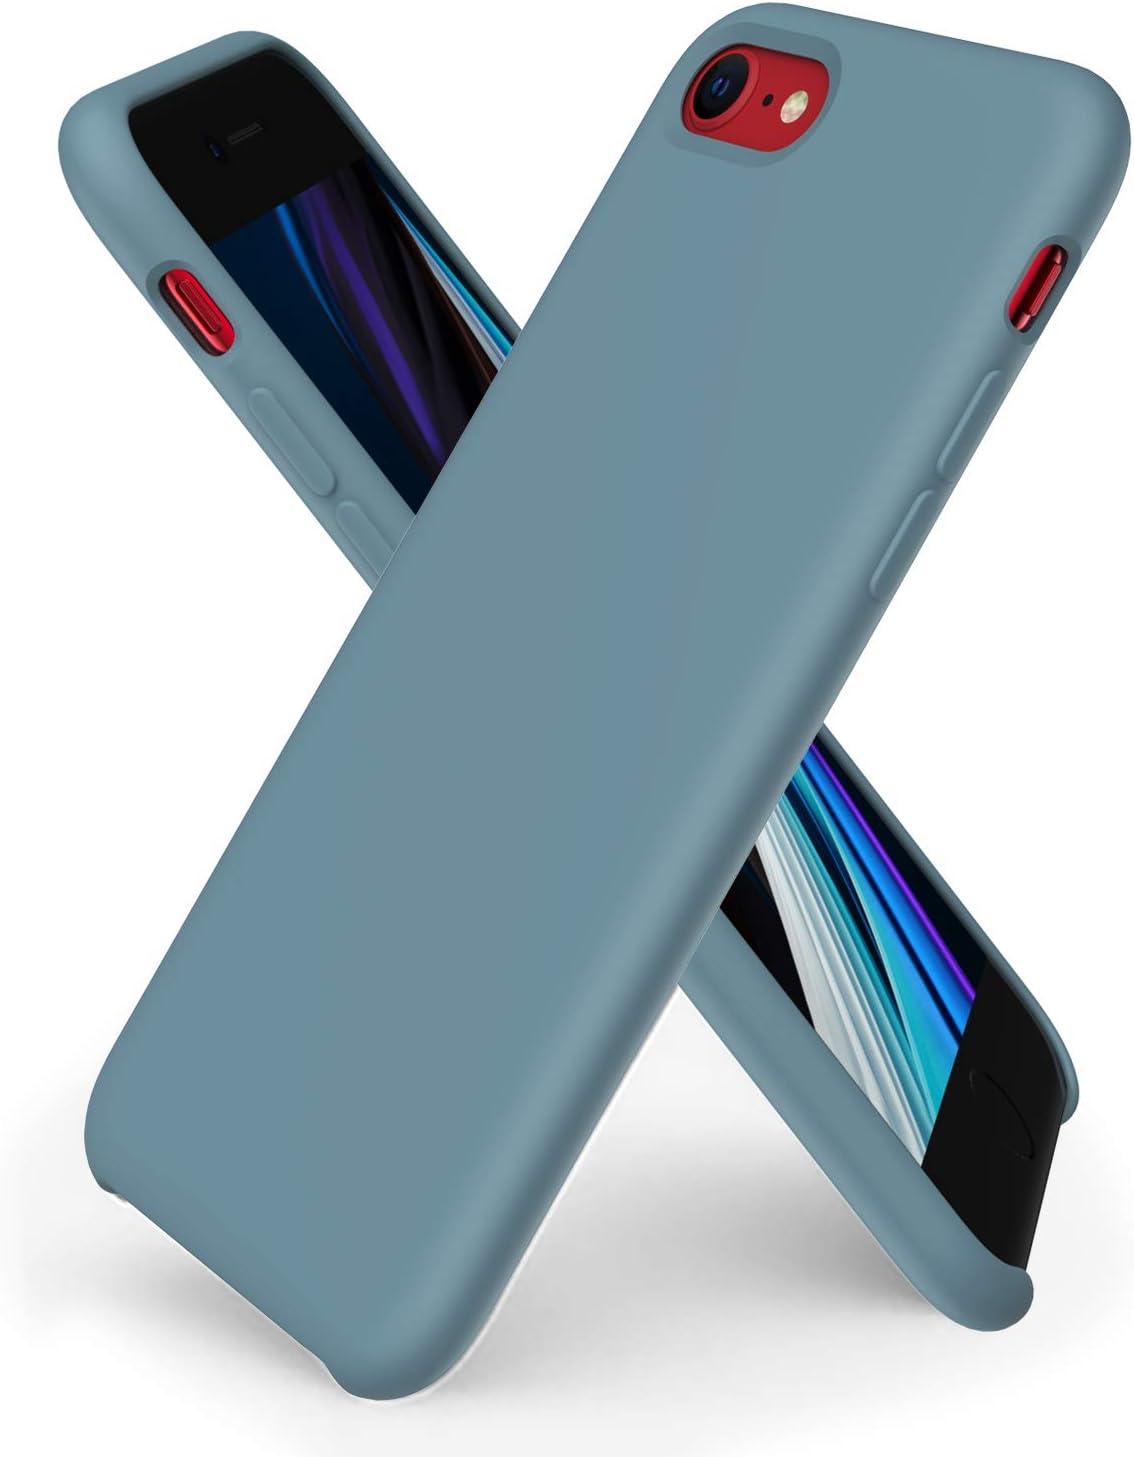 ORNARTO Liquid Silicone Case for iPhone SE(2020), iPhone 7/8 Slim Liquid Silicone Soft Gel Rubber Case Cover for iPhone SE(2020) 4.7 inch-Cactus